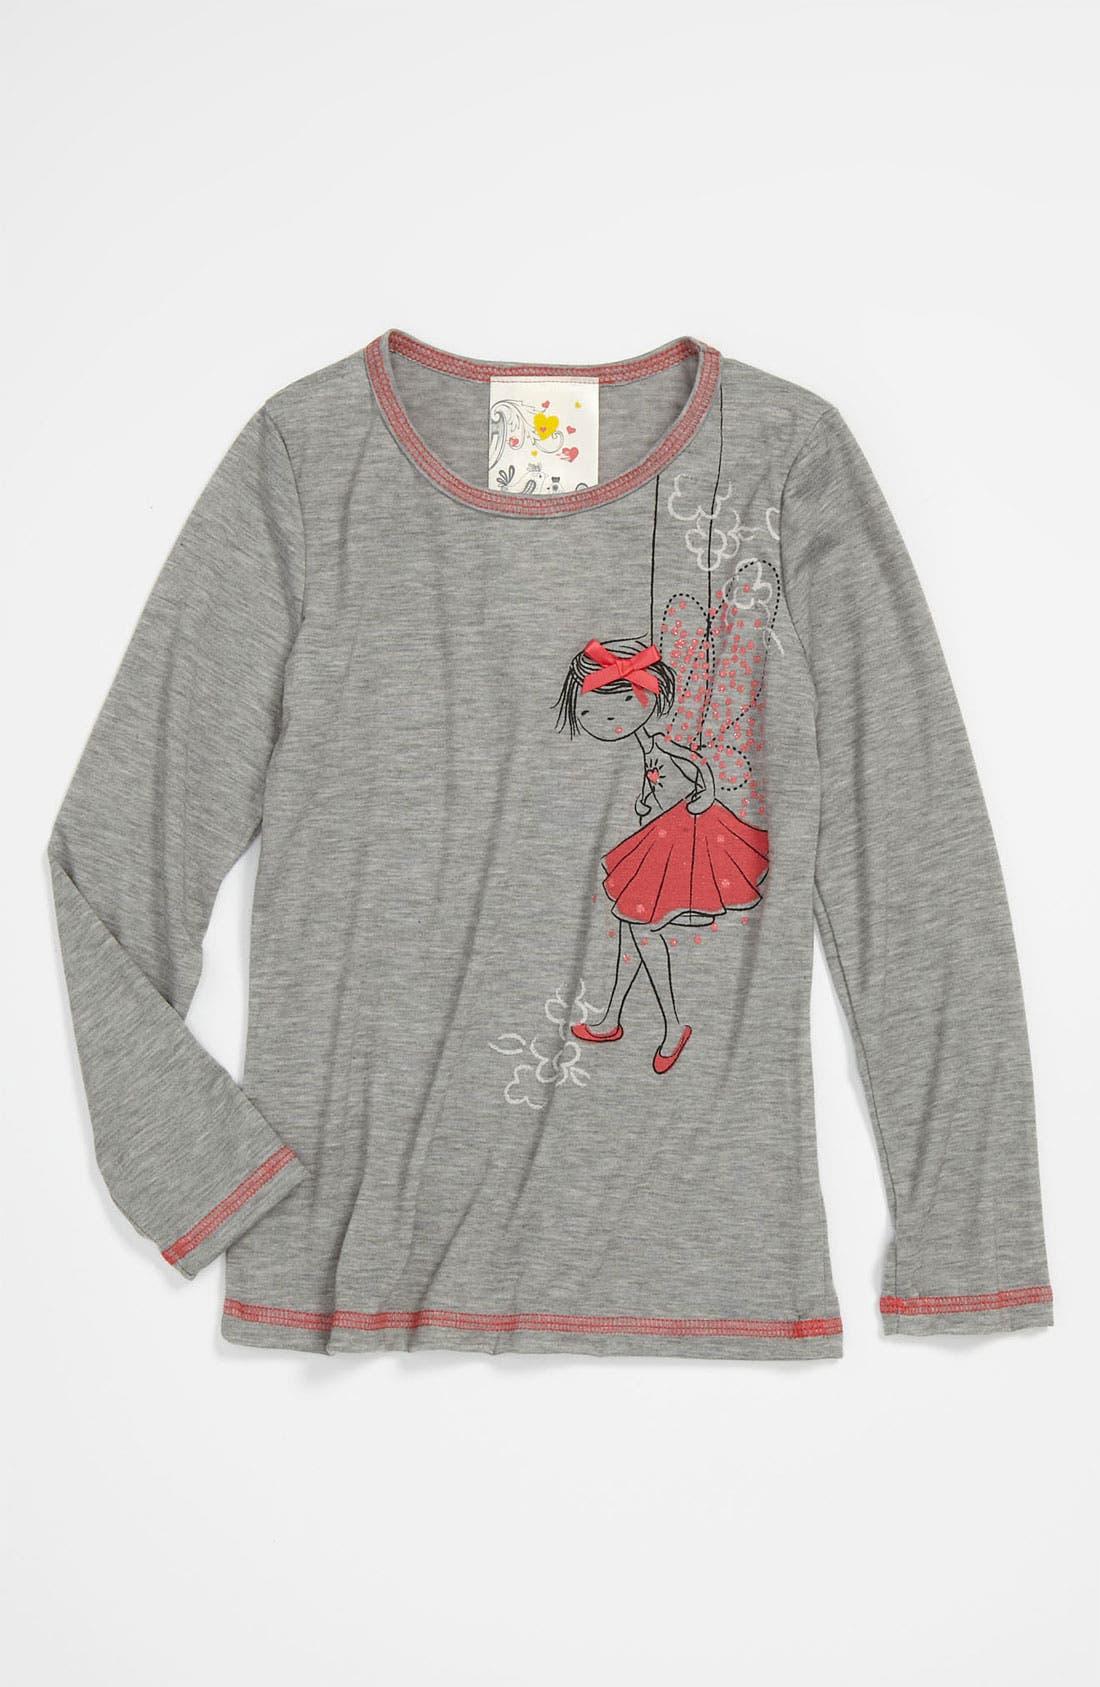 Alternate Image 1 Selected - Jenna & Jessie 'Fairy' Tee (Little Girls)